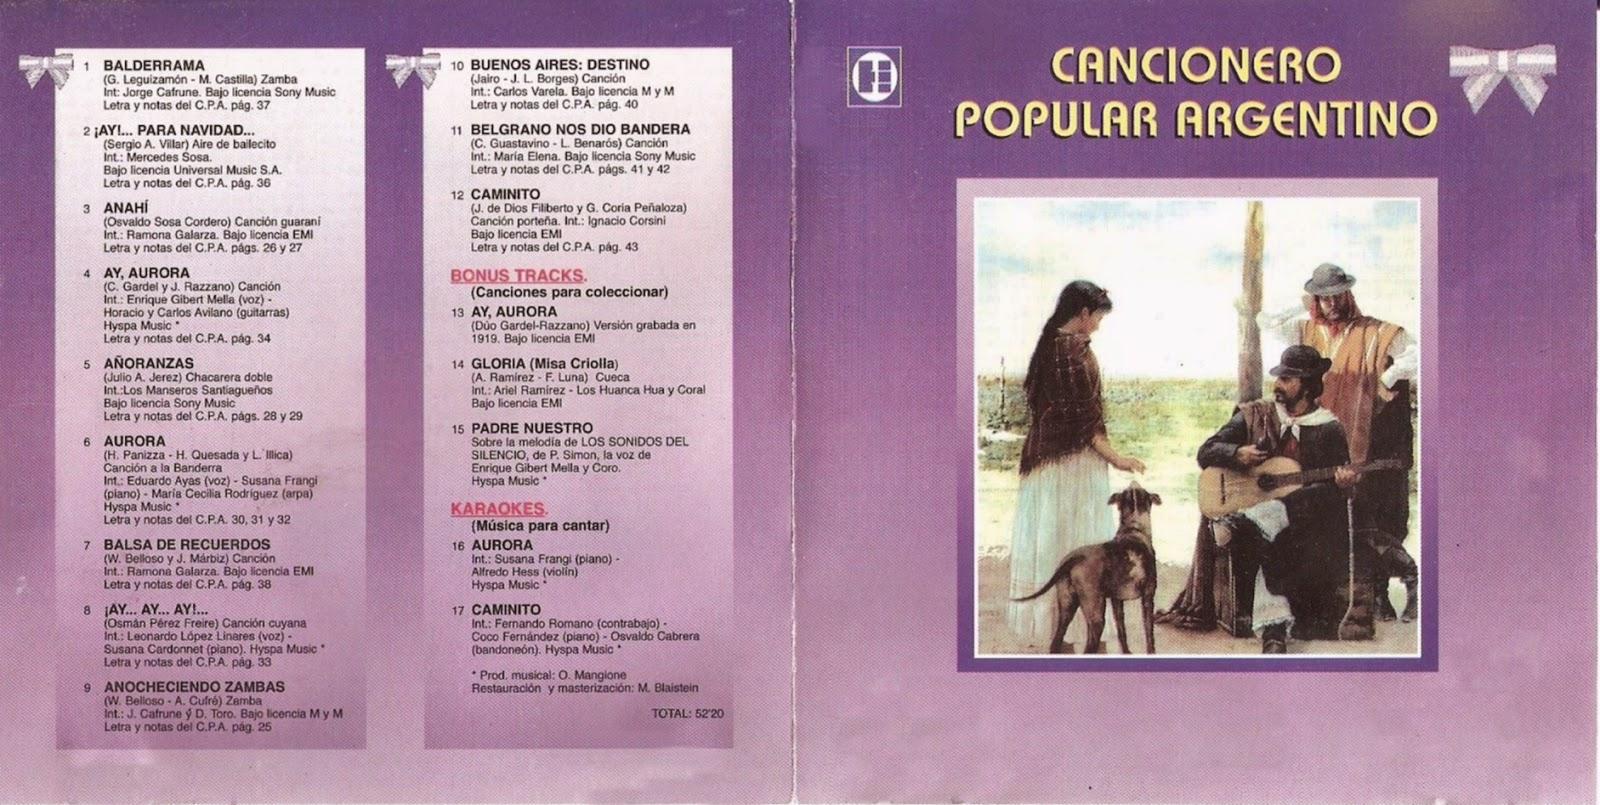 cancionero popular argentino